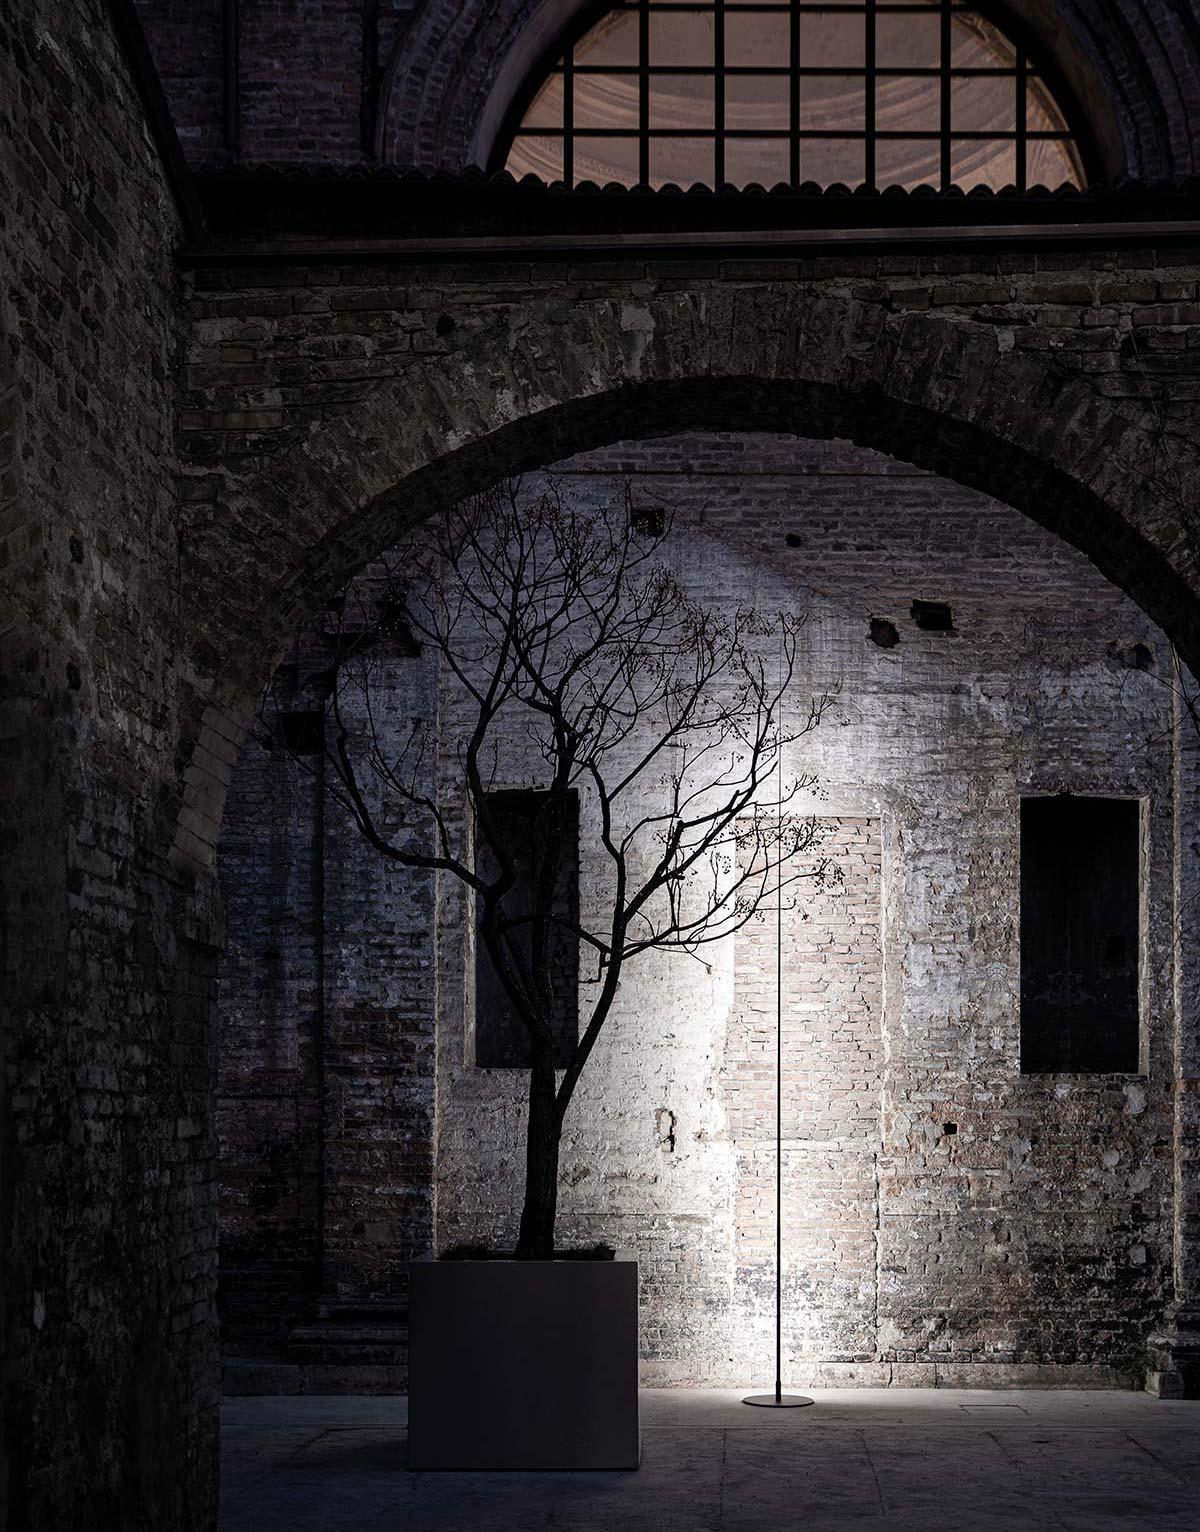 Origine by Davide Groppi